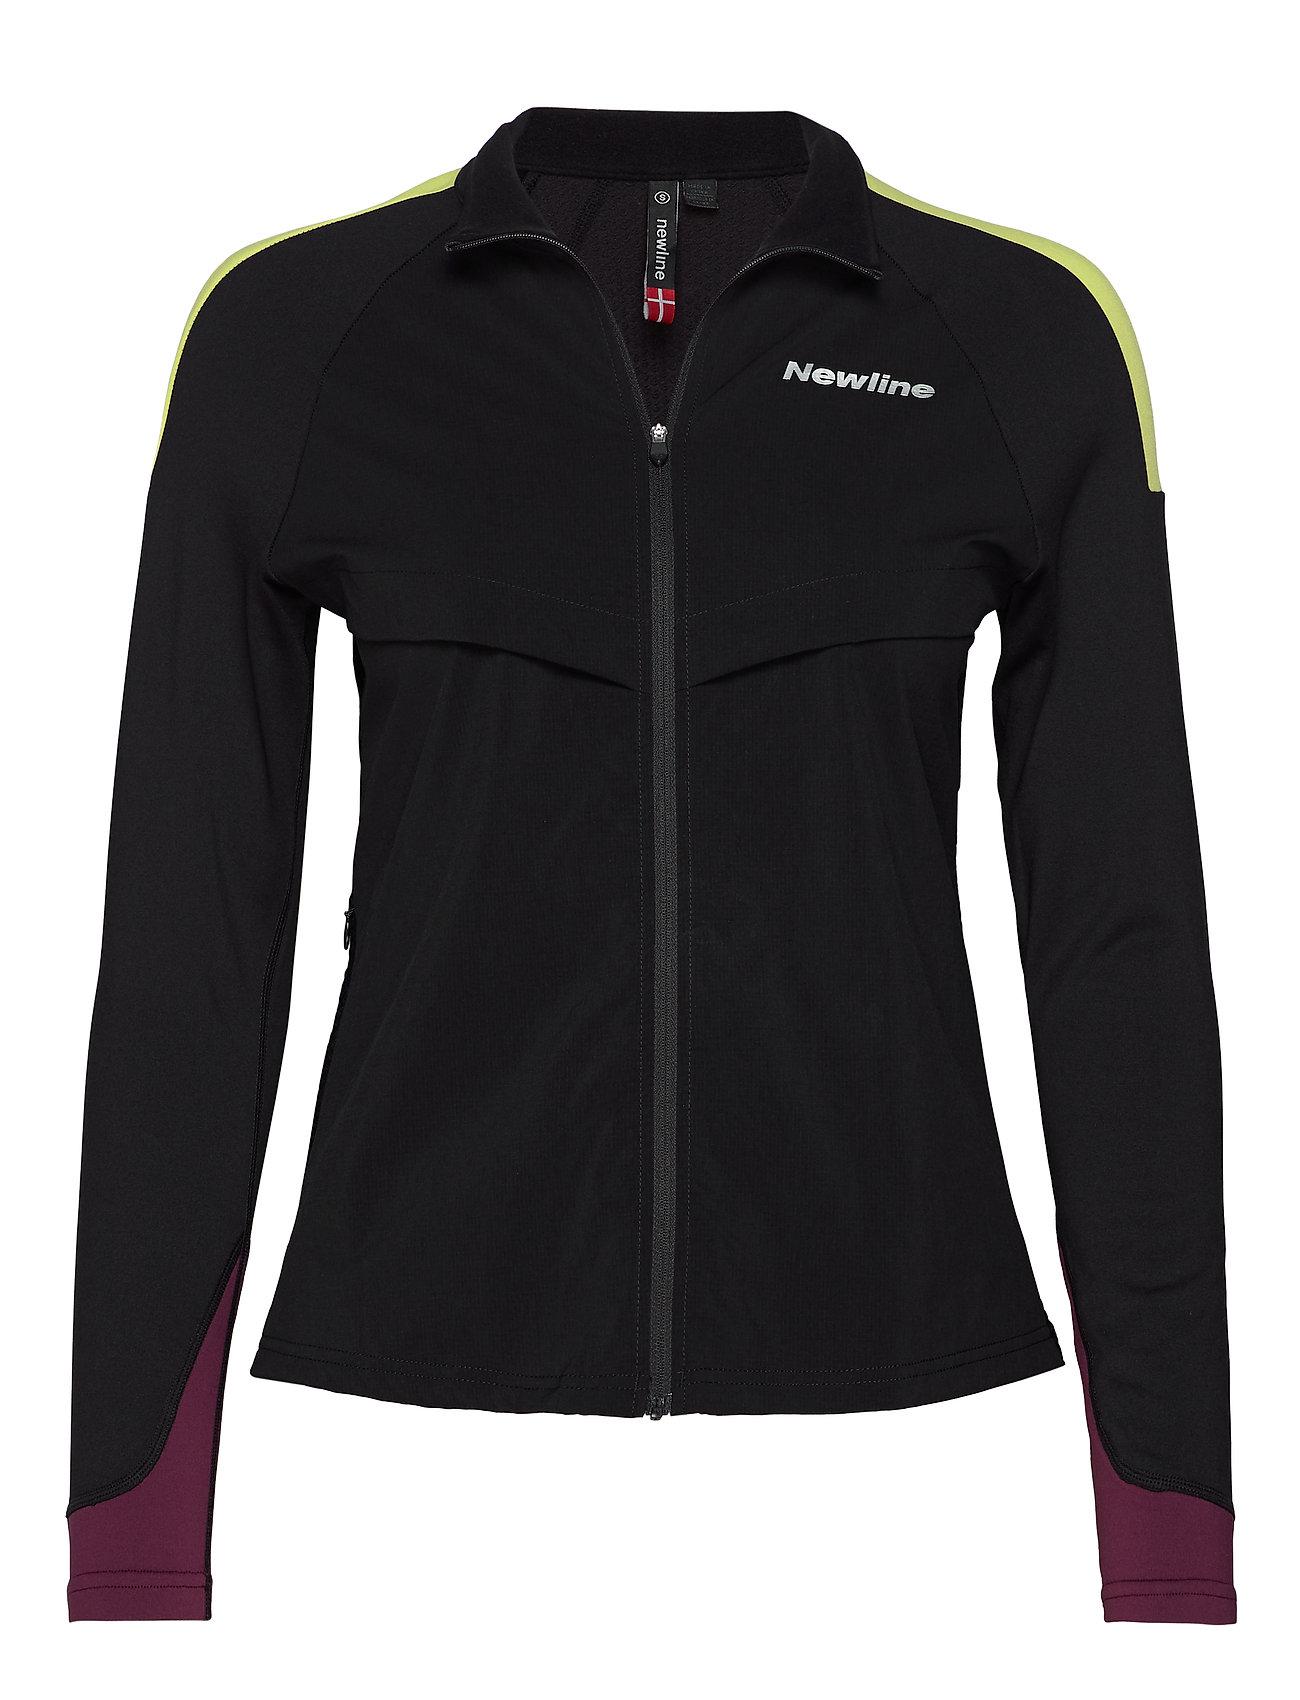 Newline Comfort Jacket - BLACK/LIME/BERRY